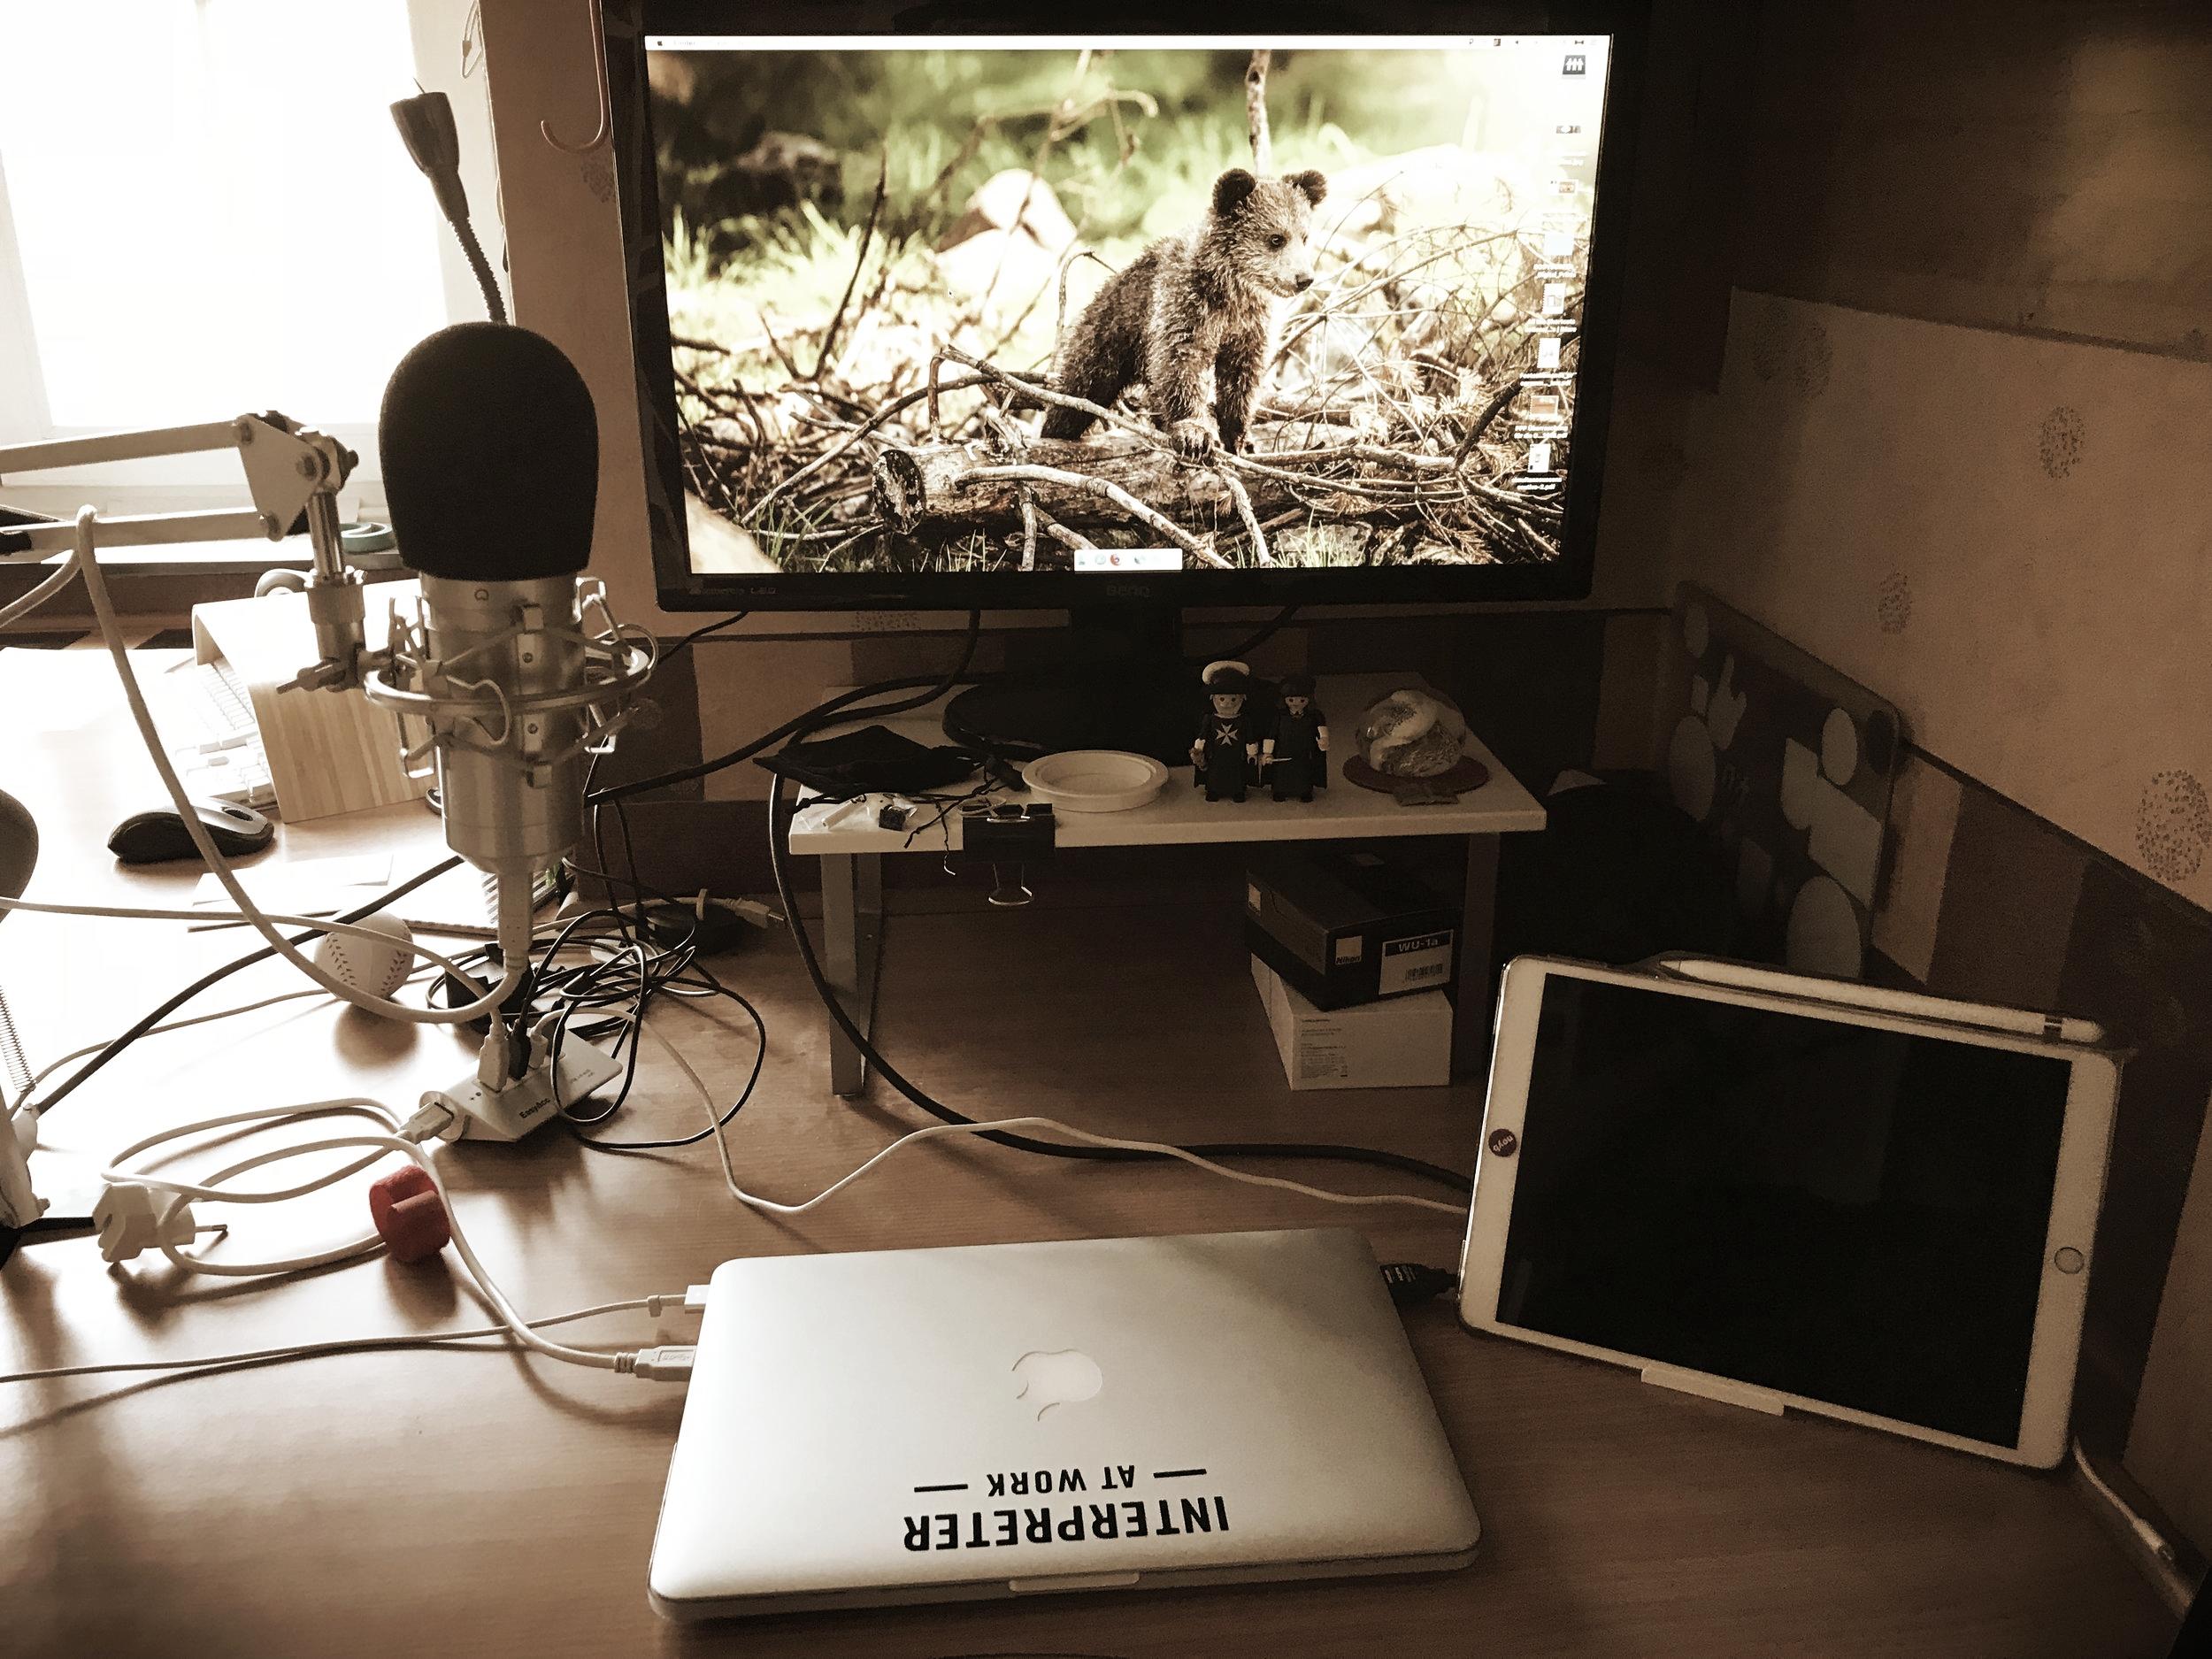 My setup for the tablet webinar